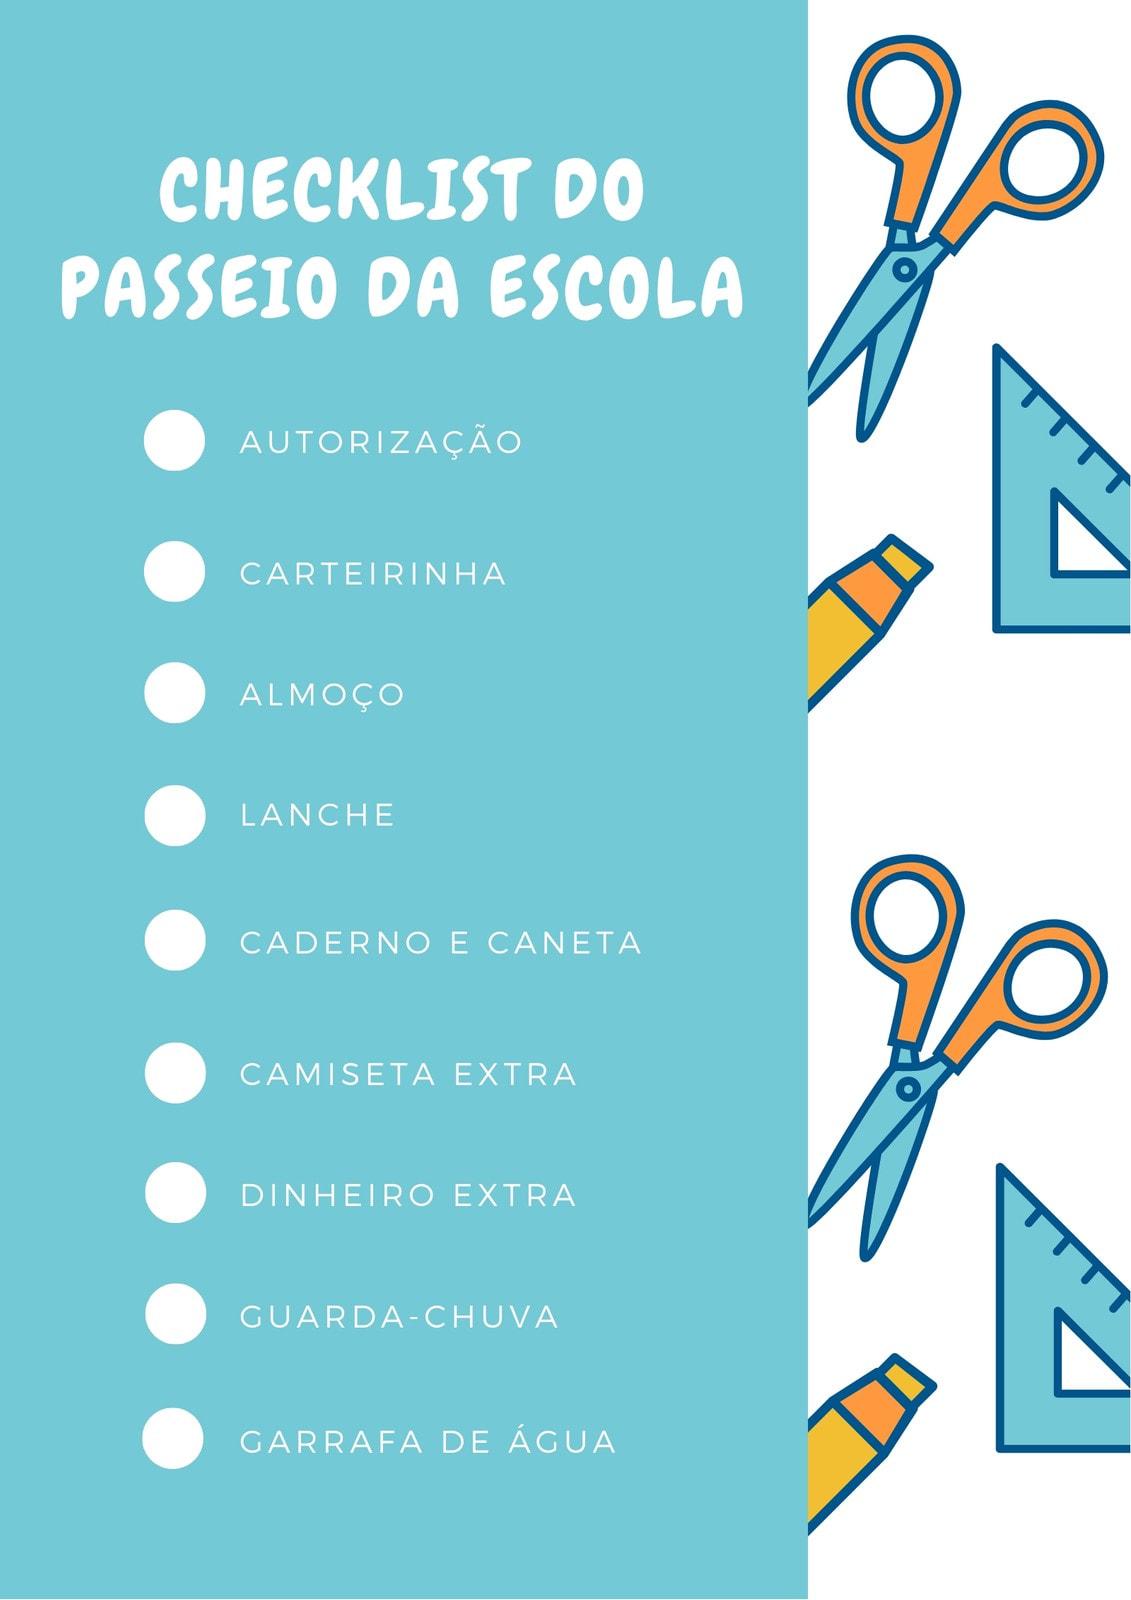 Azul e Laranja Escola Checklist